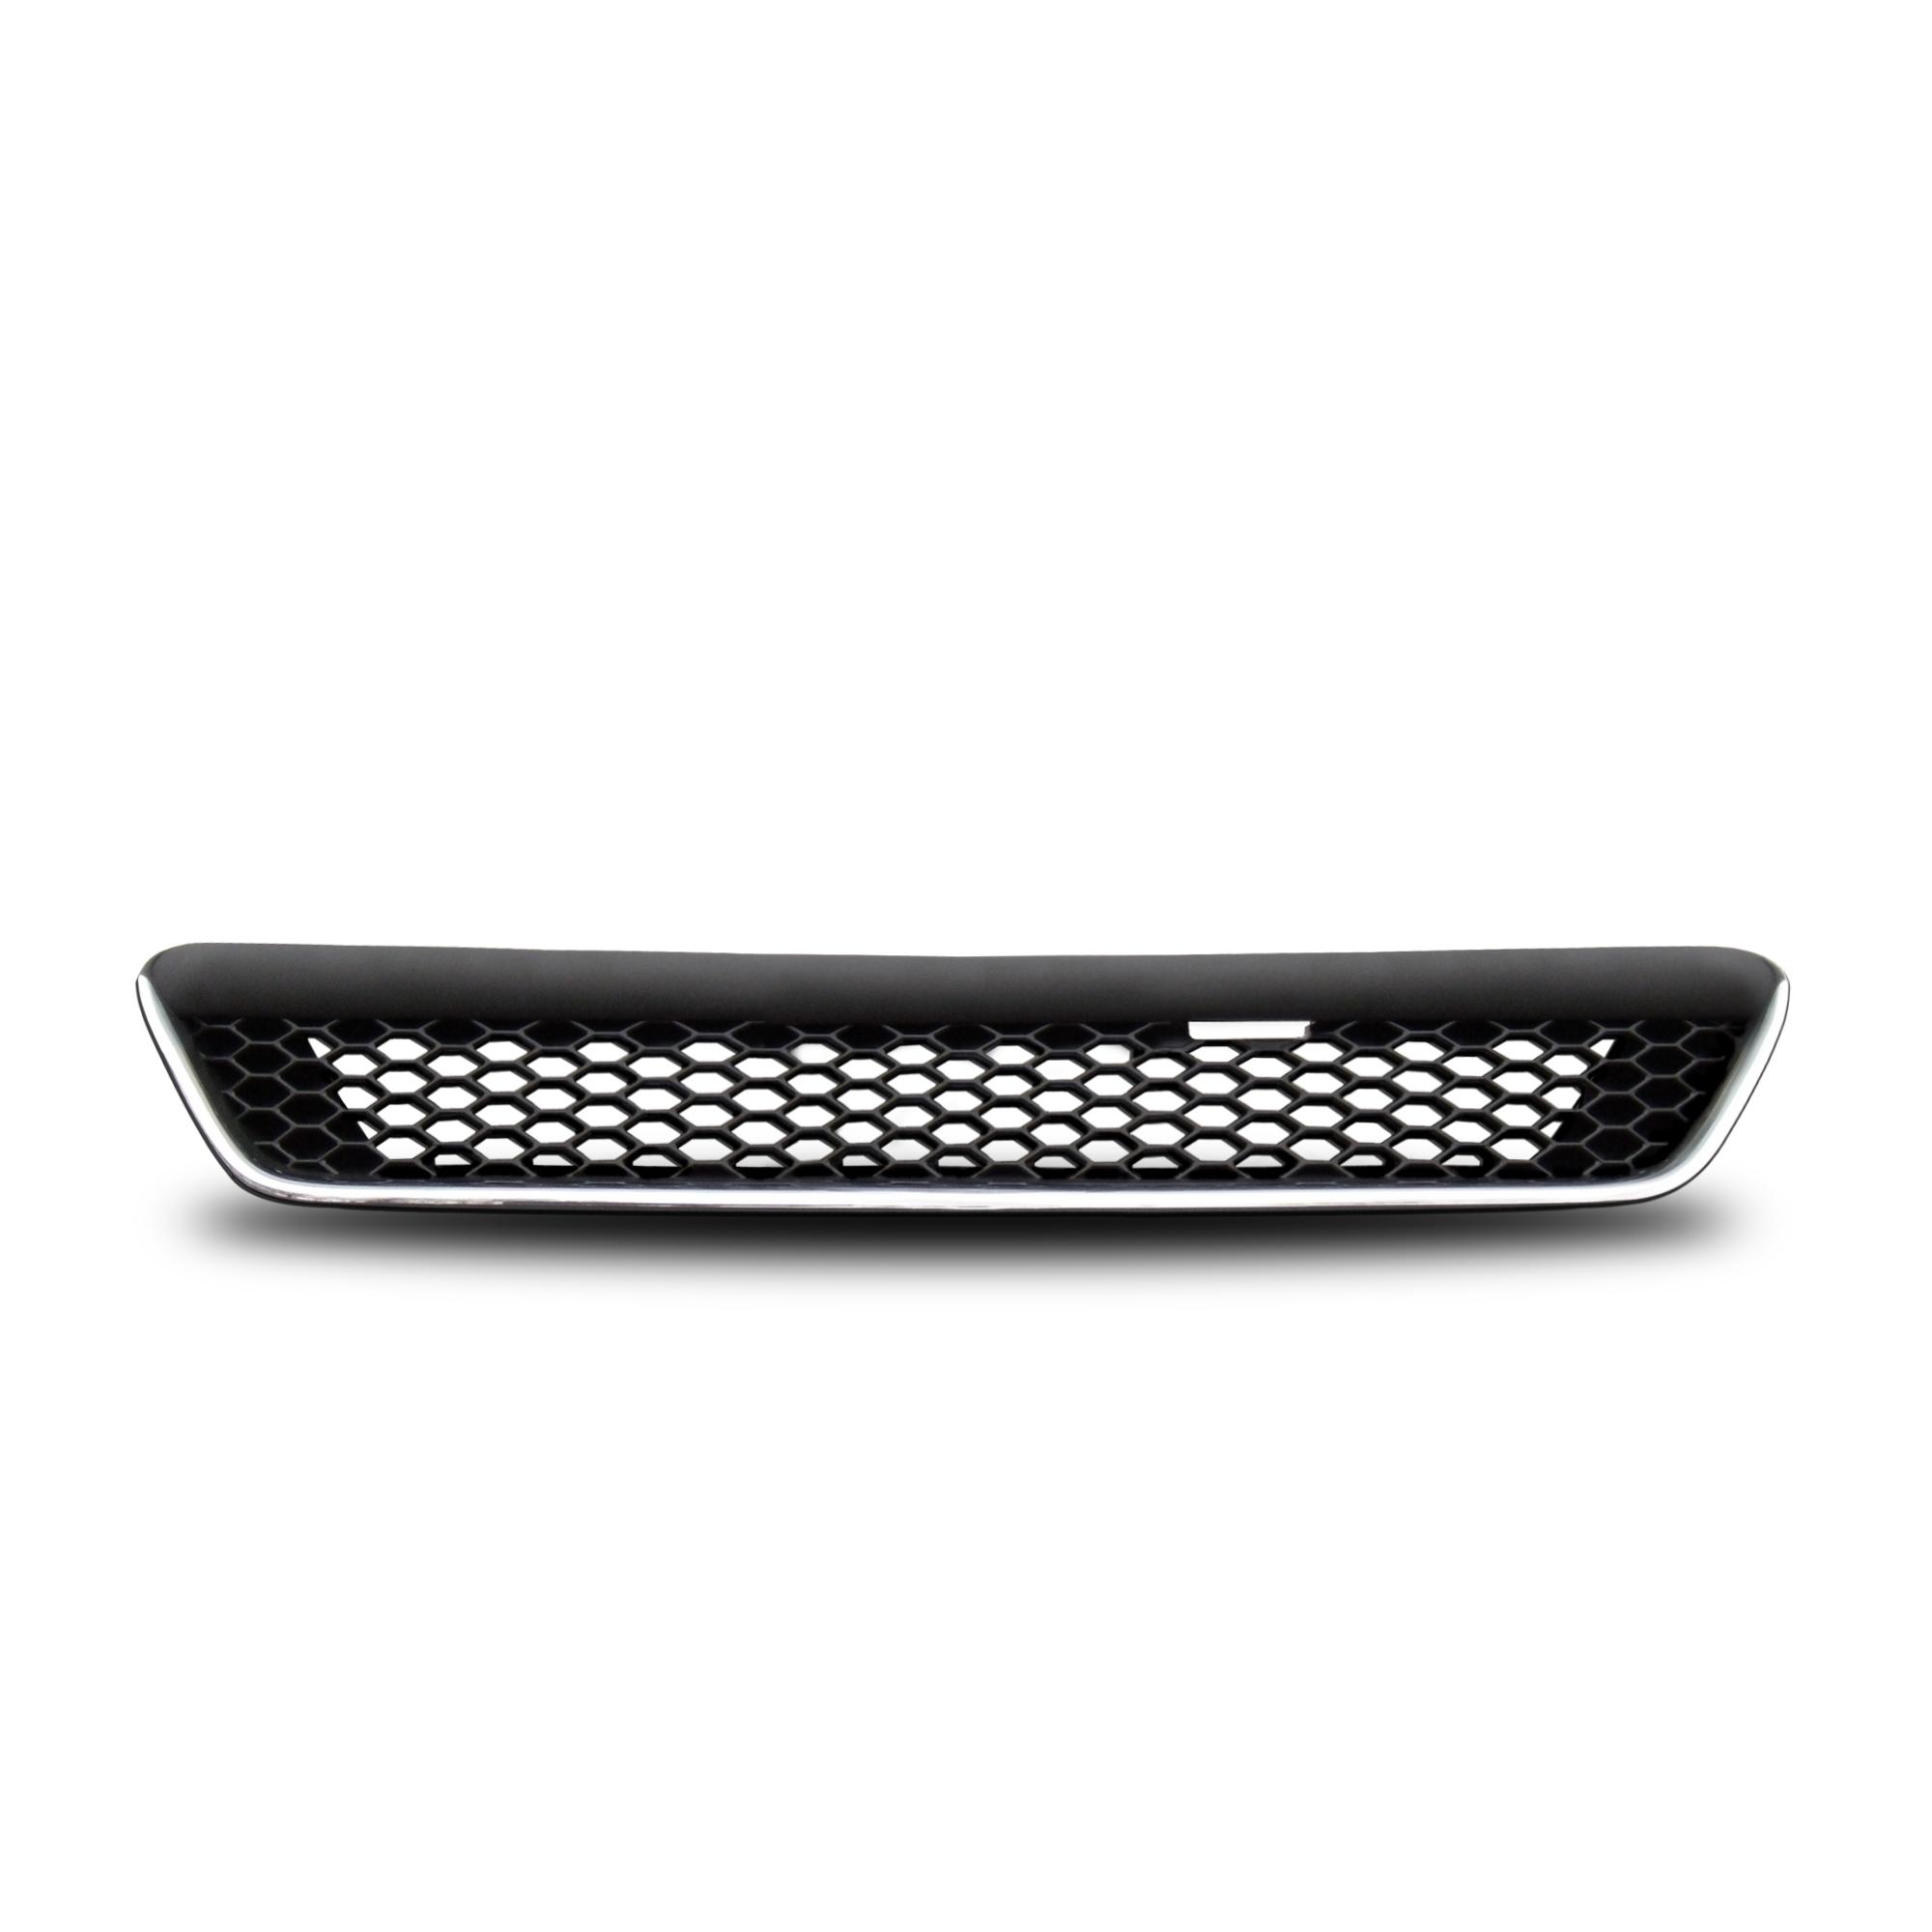 JOM Frontgrill sports look med diamant look i blank sort/krom til Opel Astra G - uden logo Styling